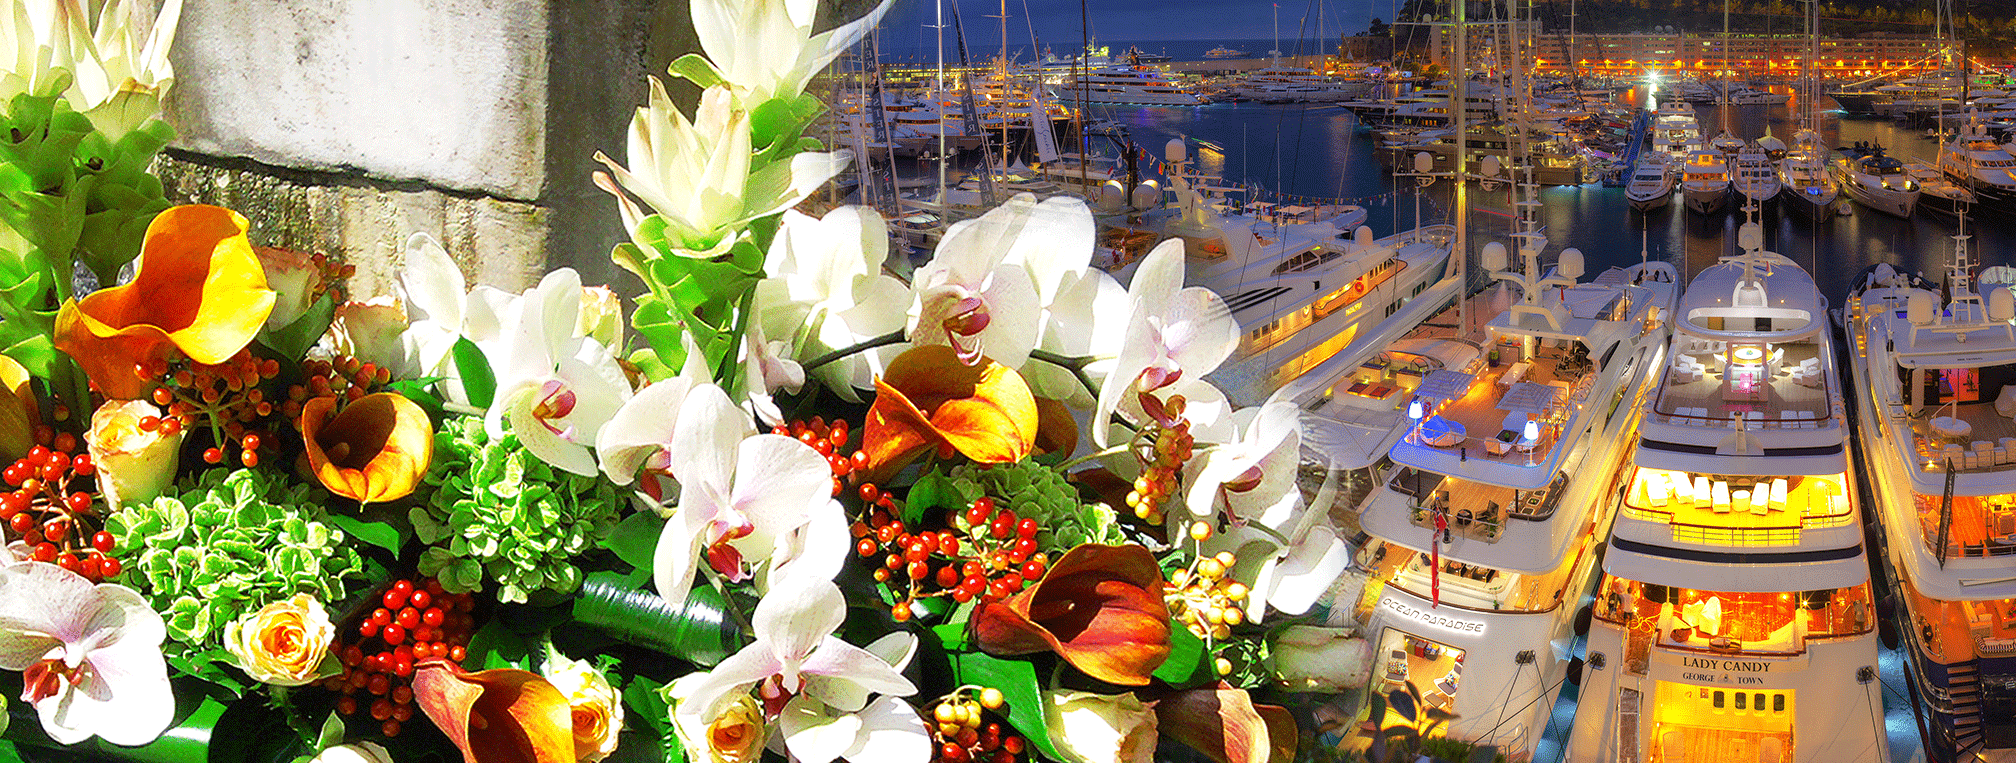 Amaryllis English Florist For Yachts In Monaco Antibes Cannes Saint Tropez La Ciotat Golfe Juan Imperia San Remo And Genova